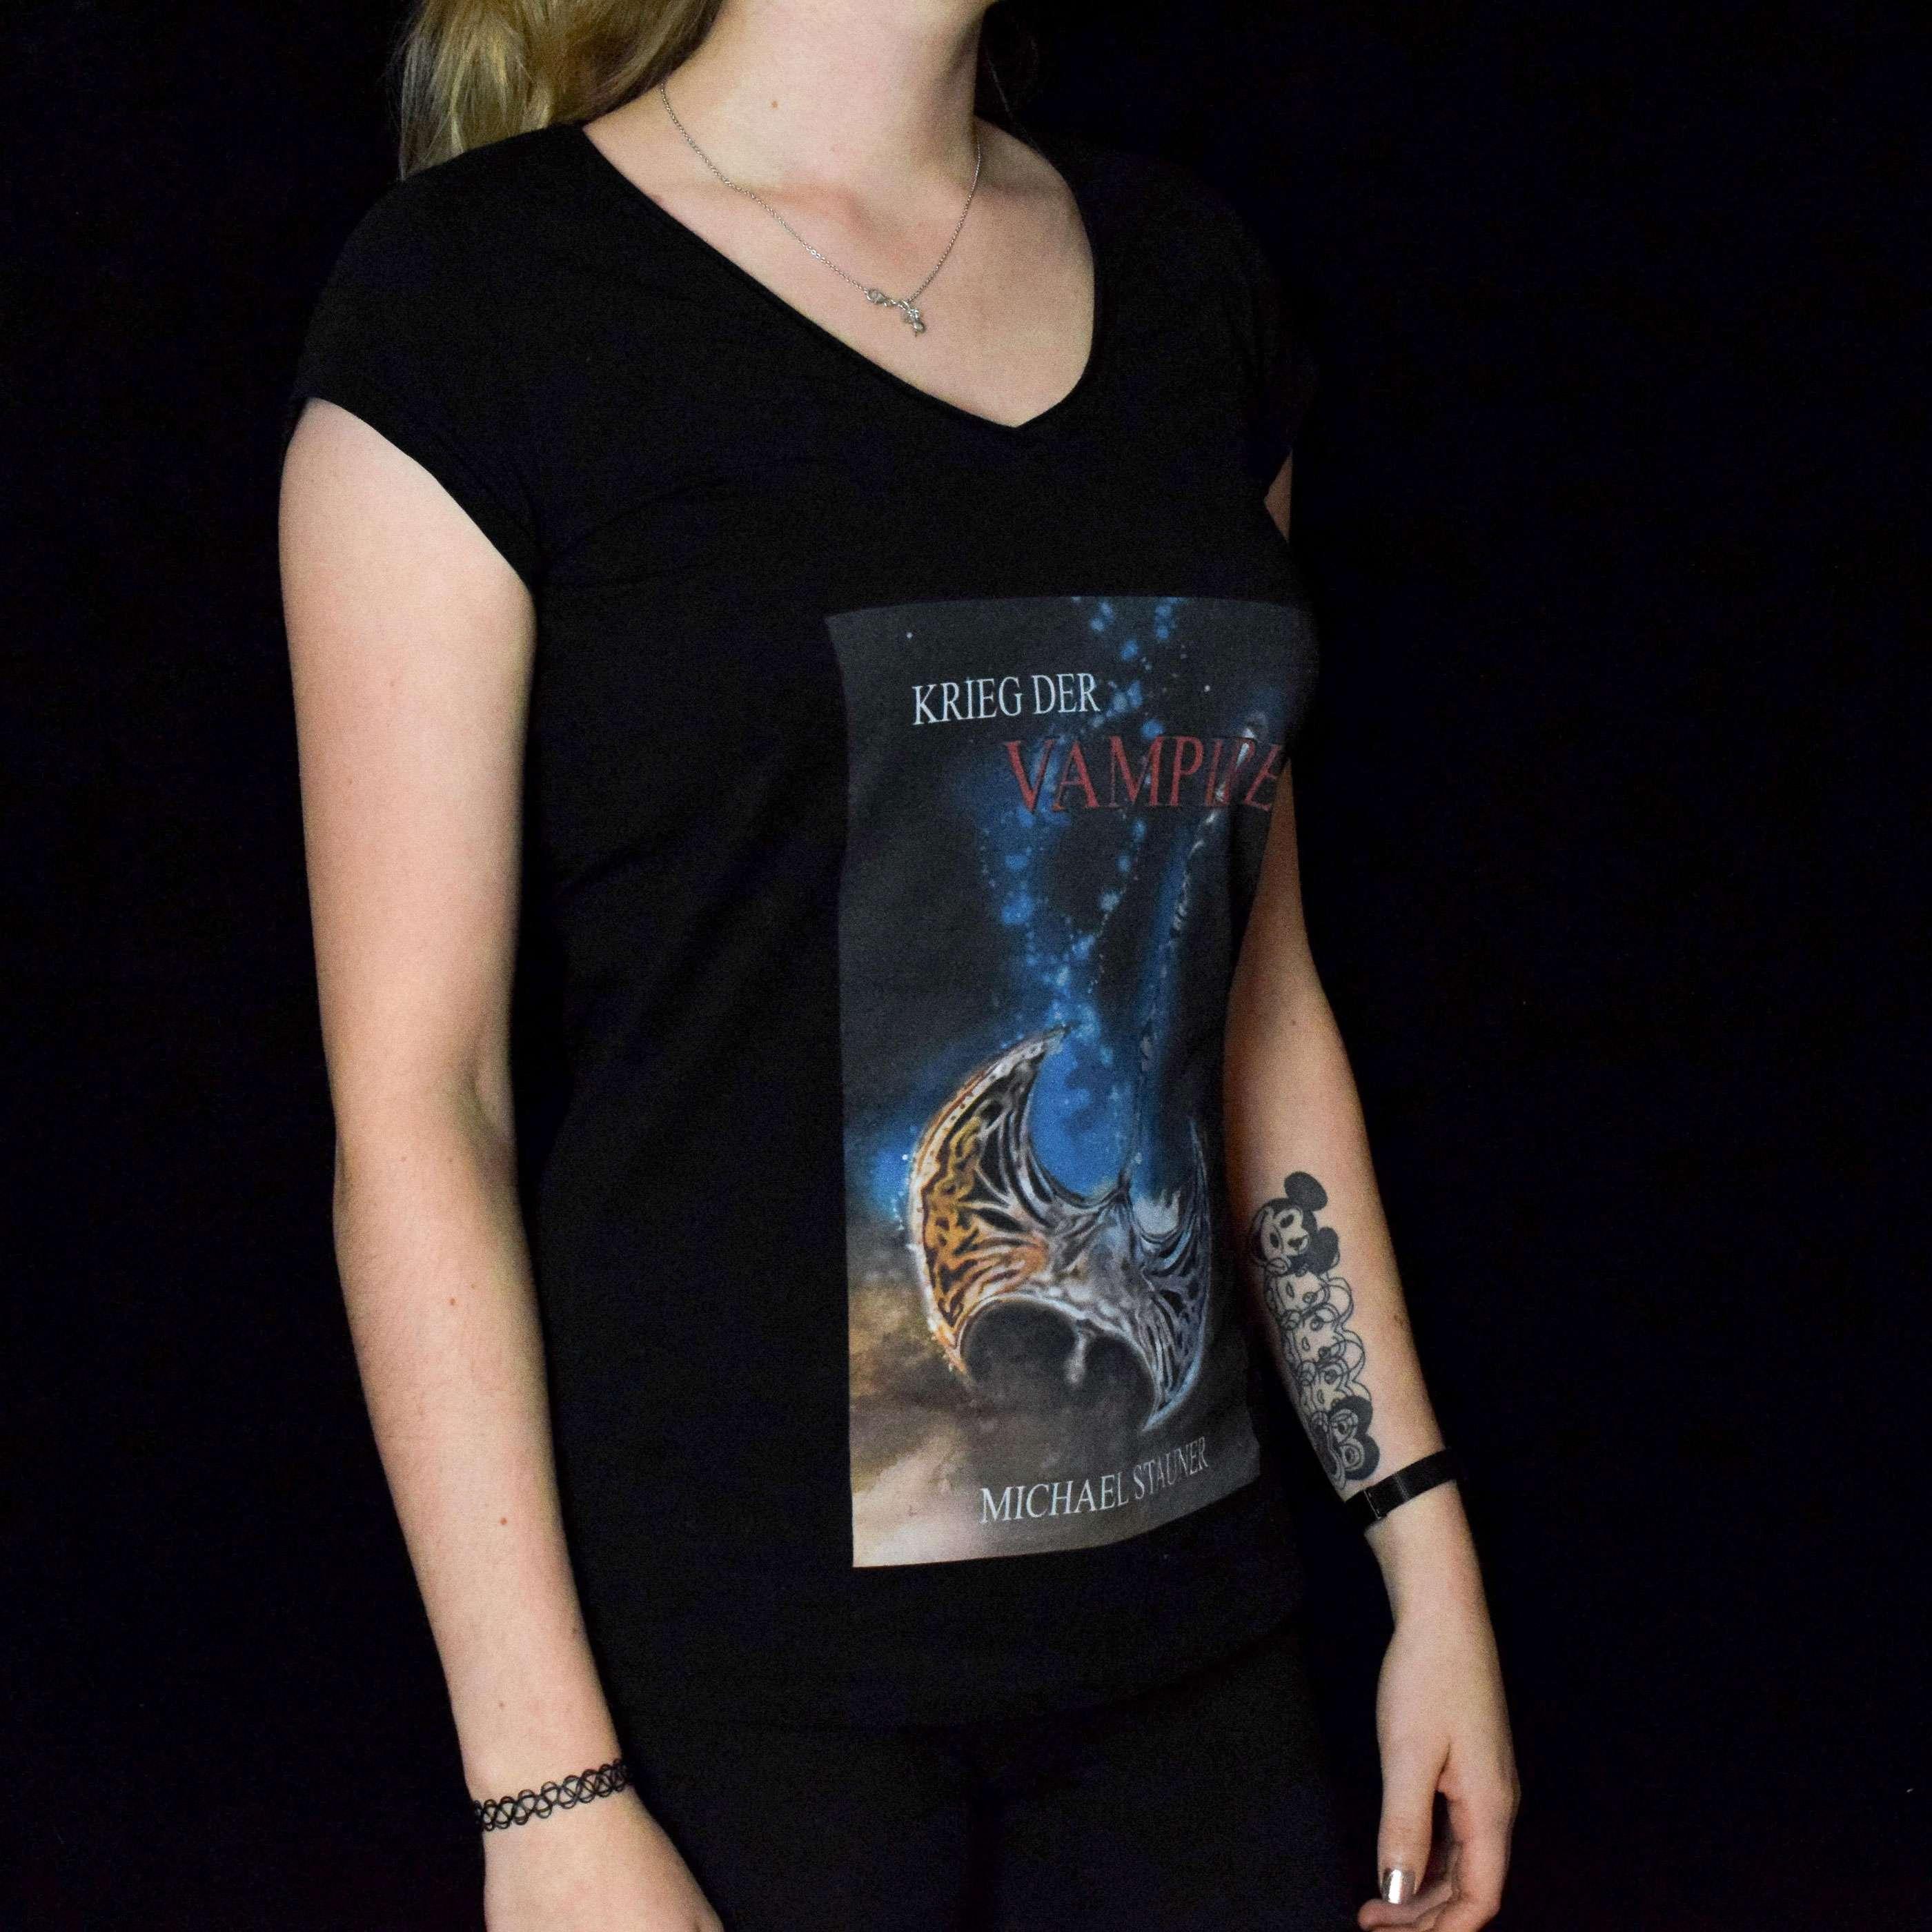 michael-stauner-merchandise-krieg-der-vampire-shirt-girl.jpg